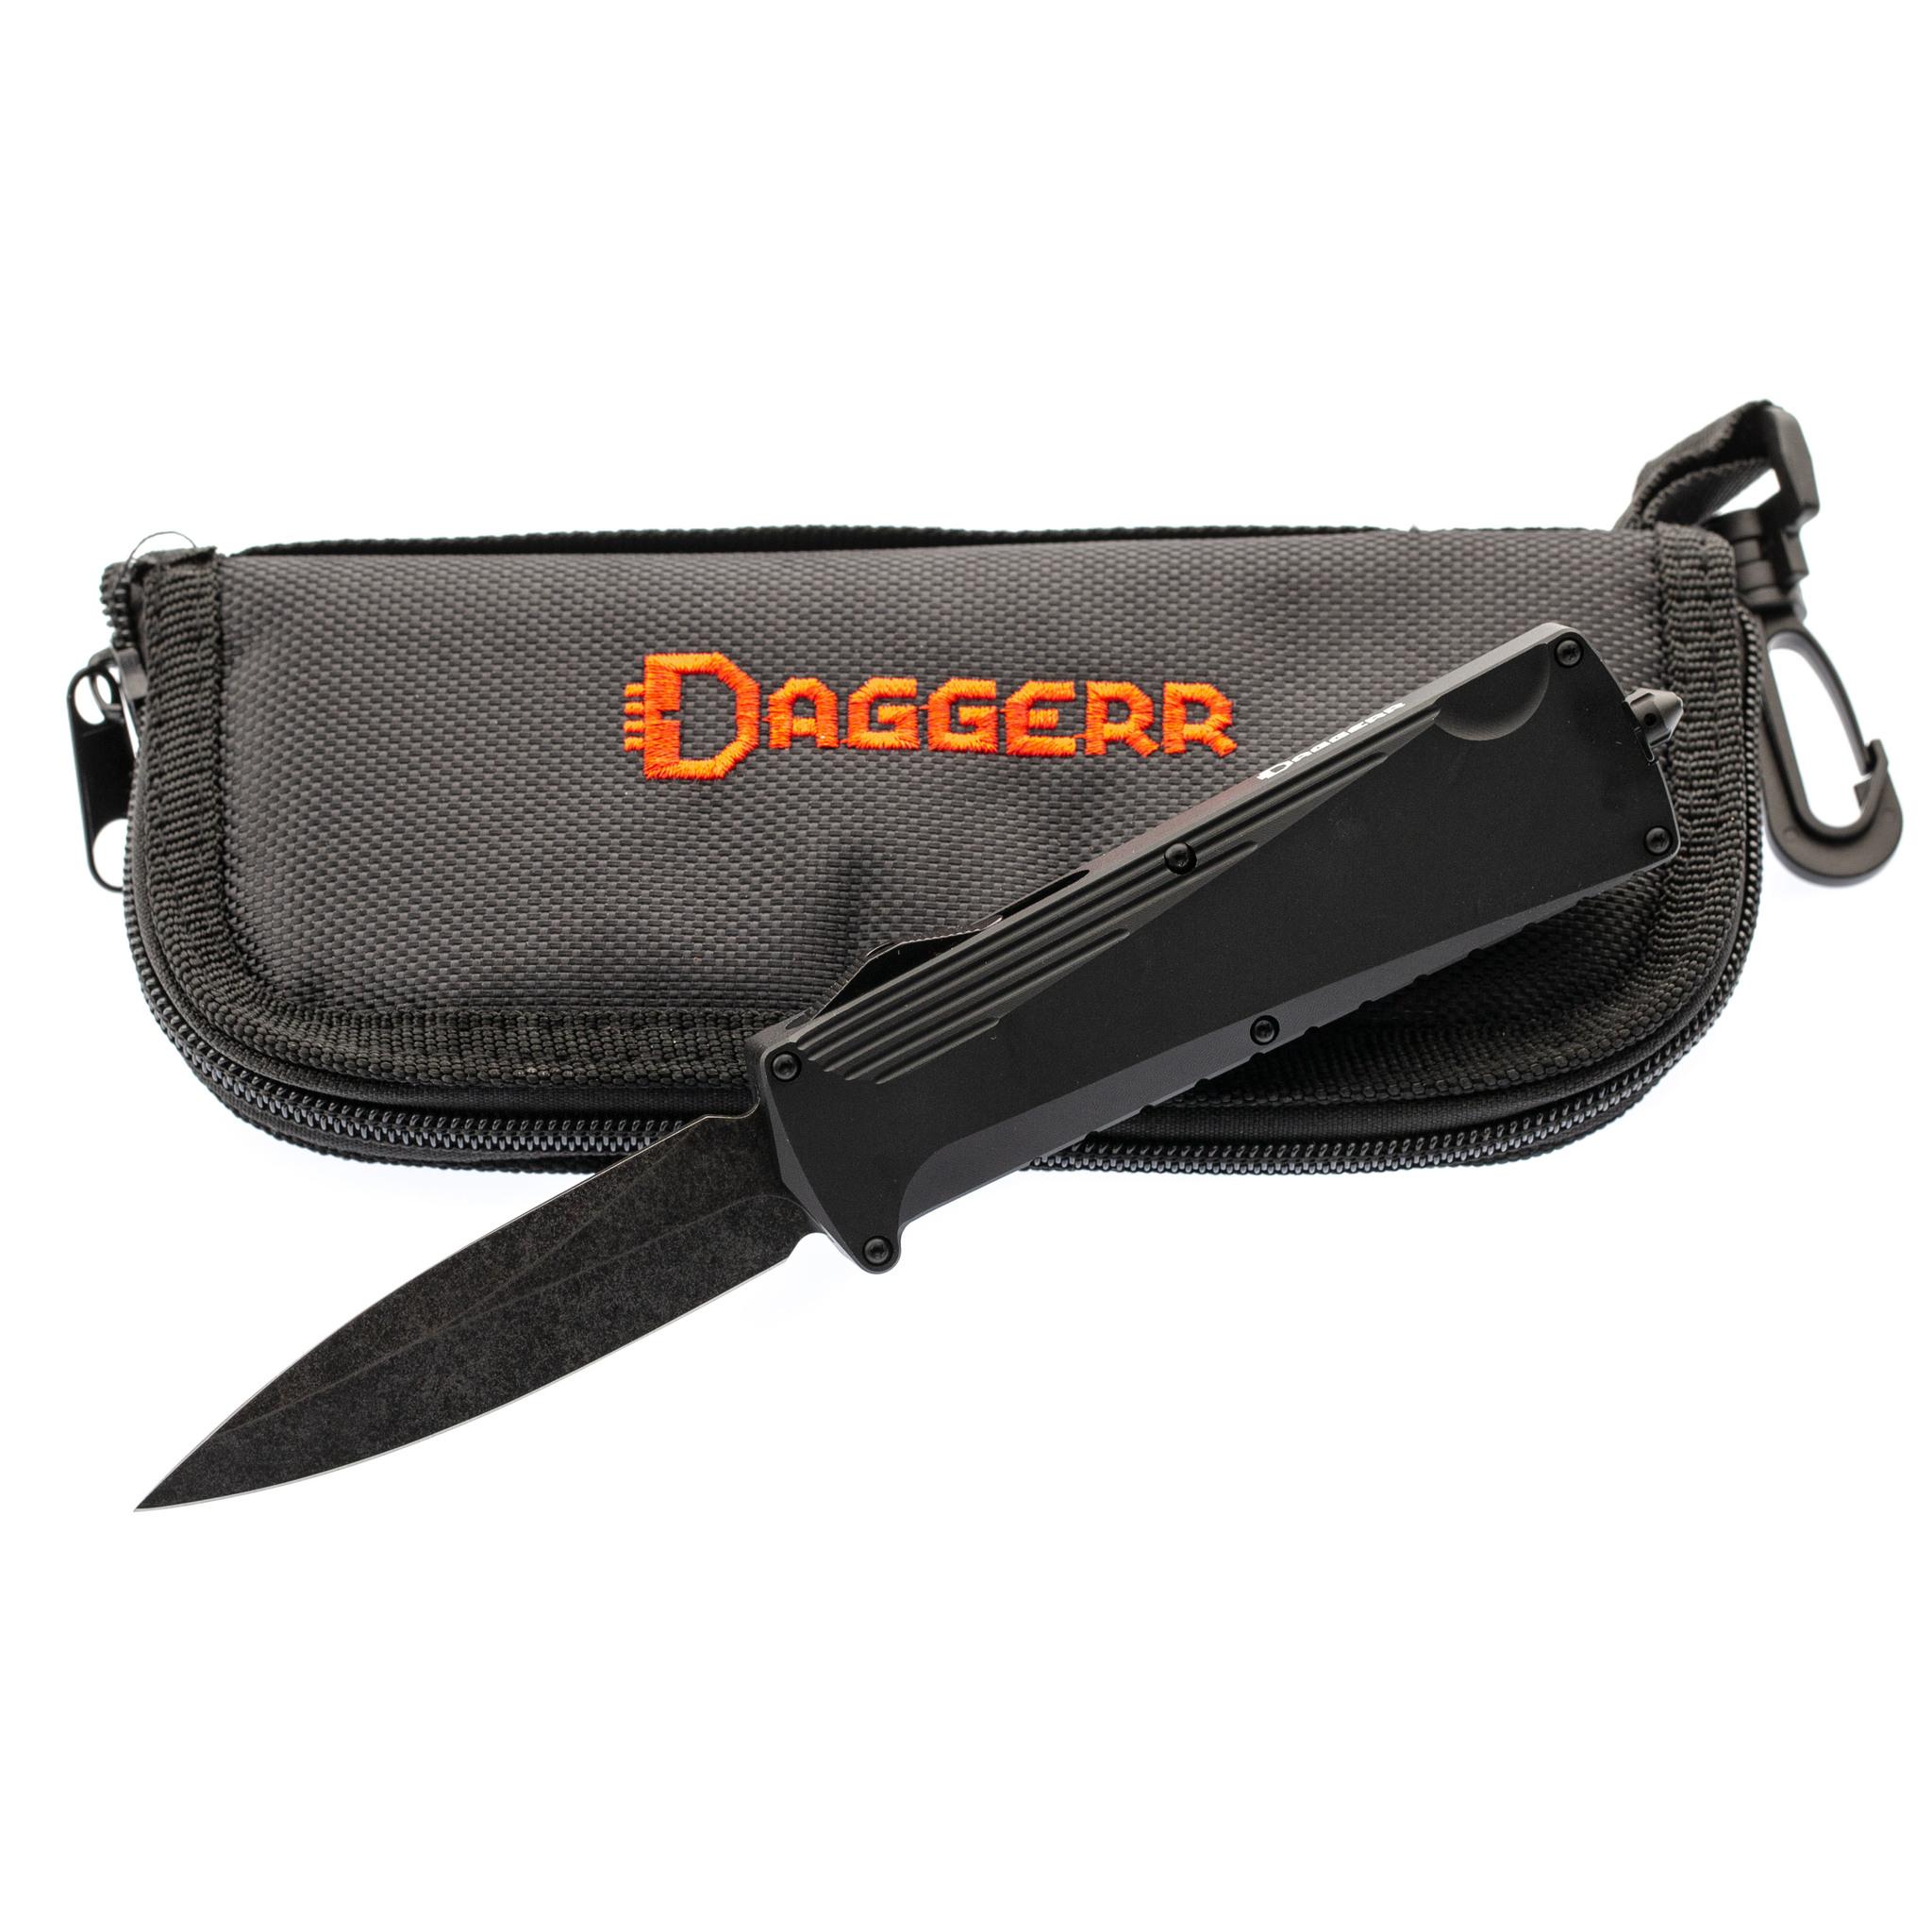 Автоматический нож Daggerr Koschei All Black (Кощей), сталь D2